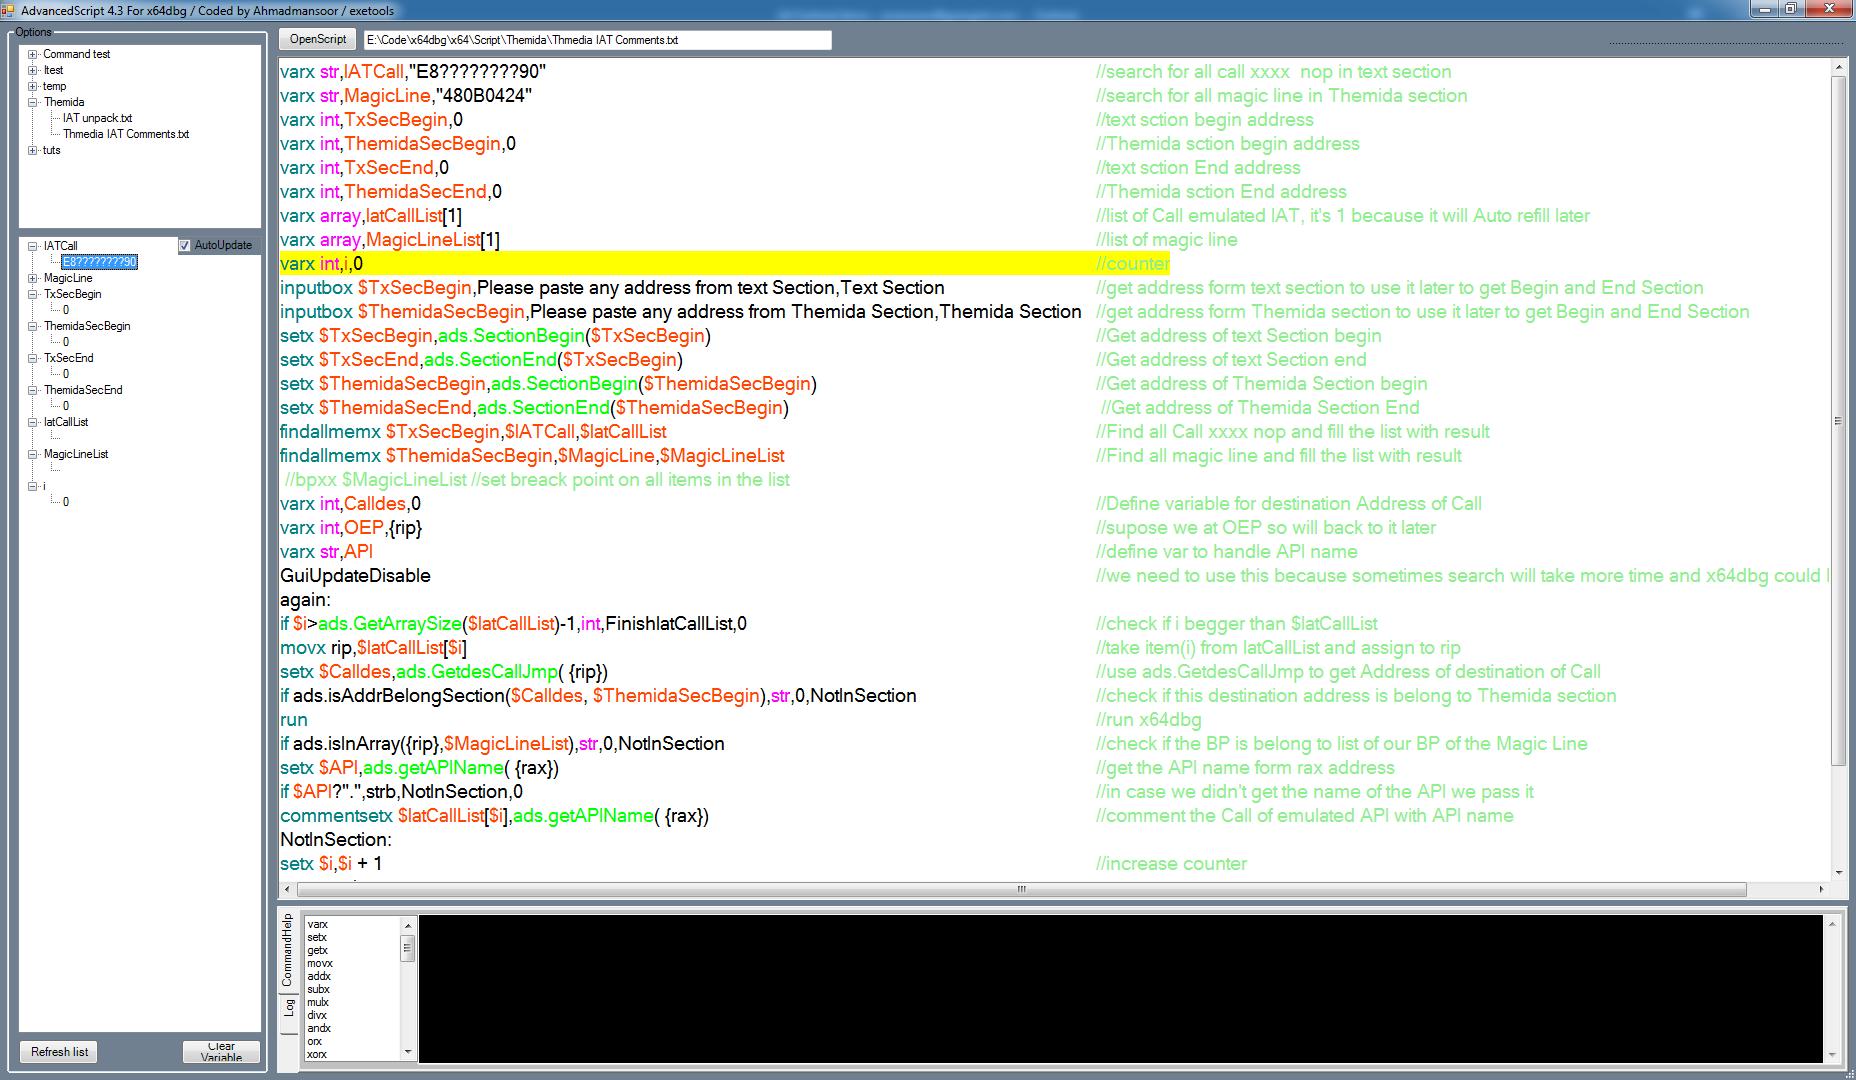 AdvancedScript_4 3